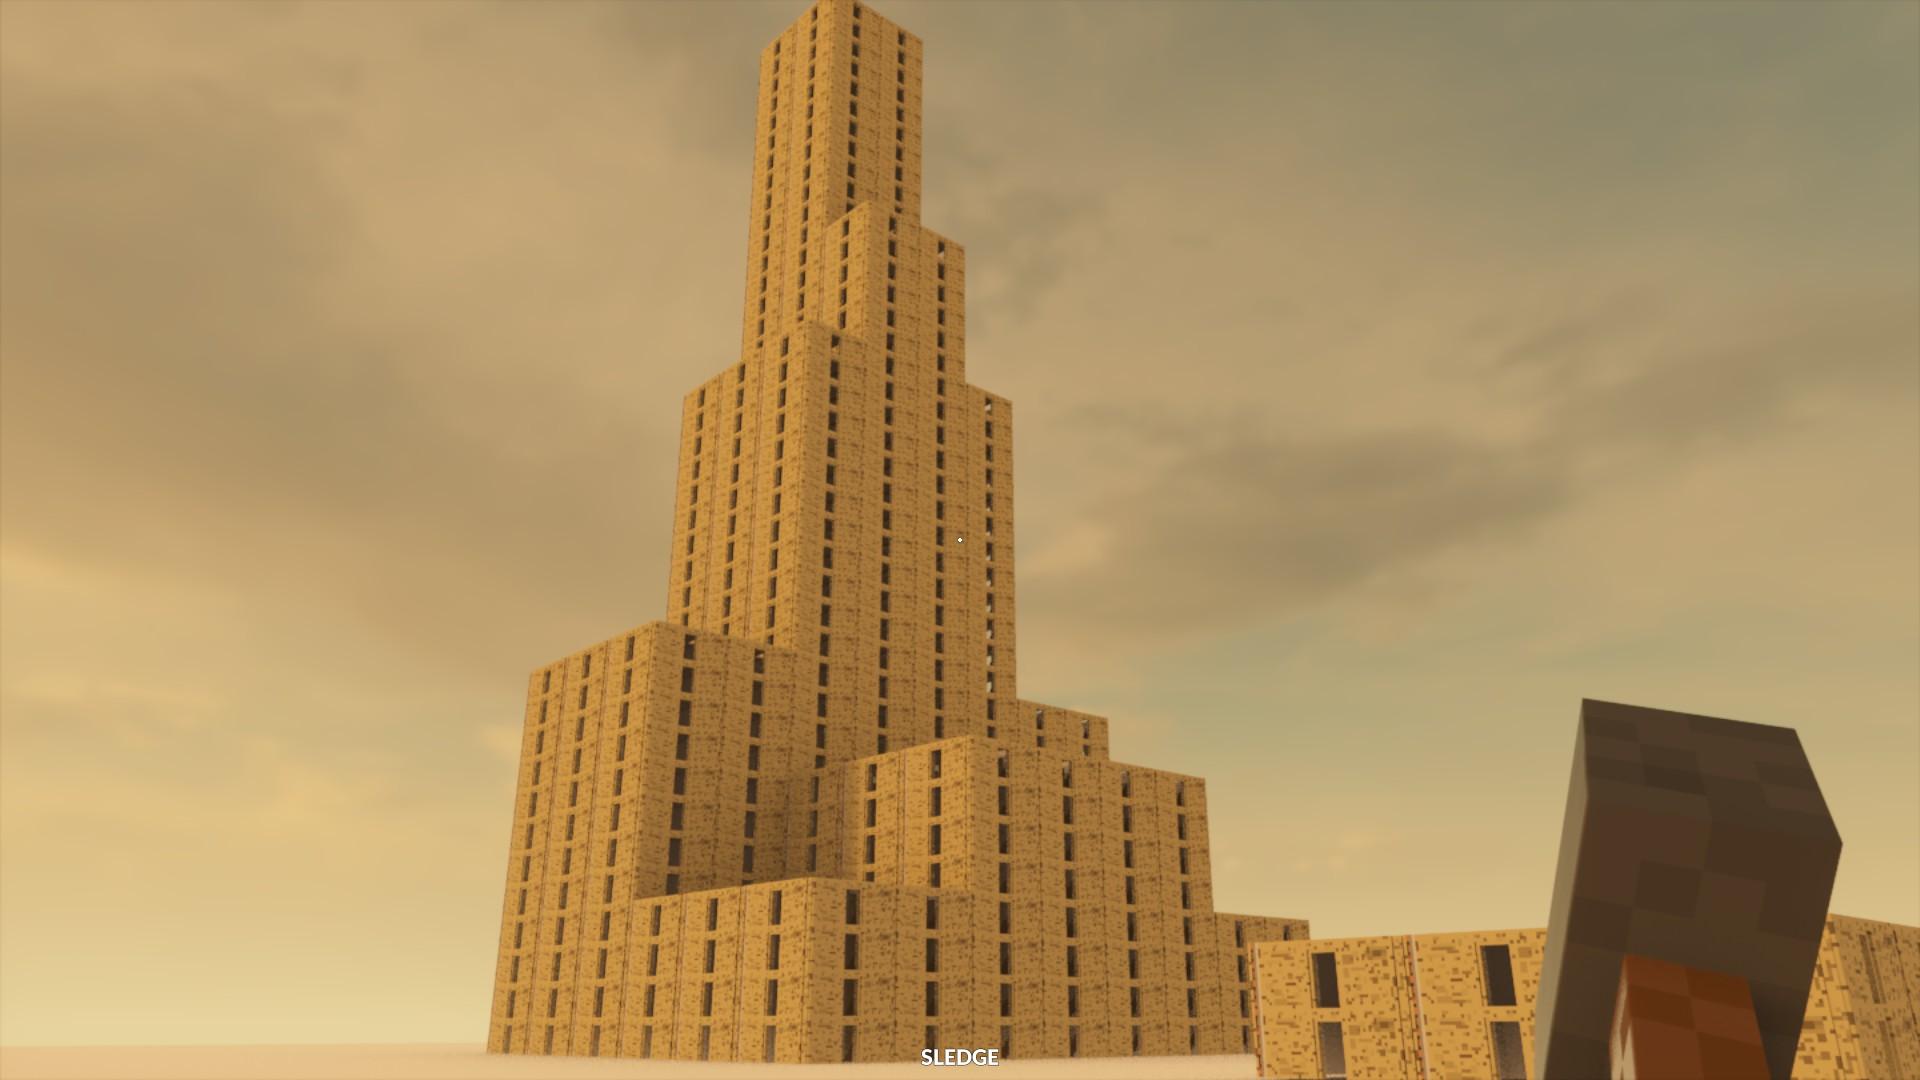 Teardown: The highest building Mods